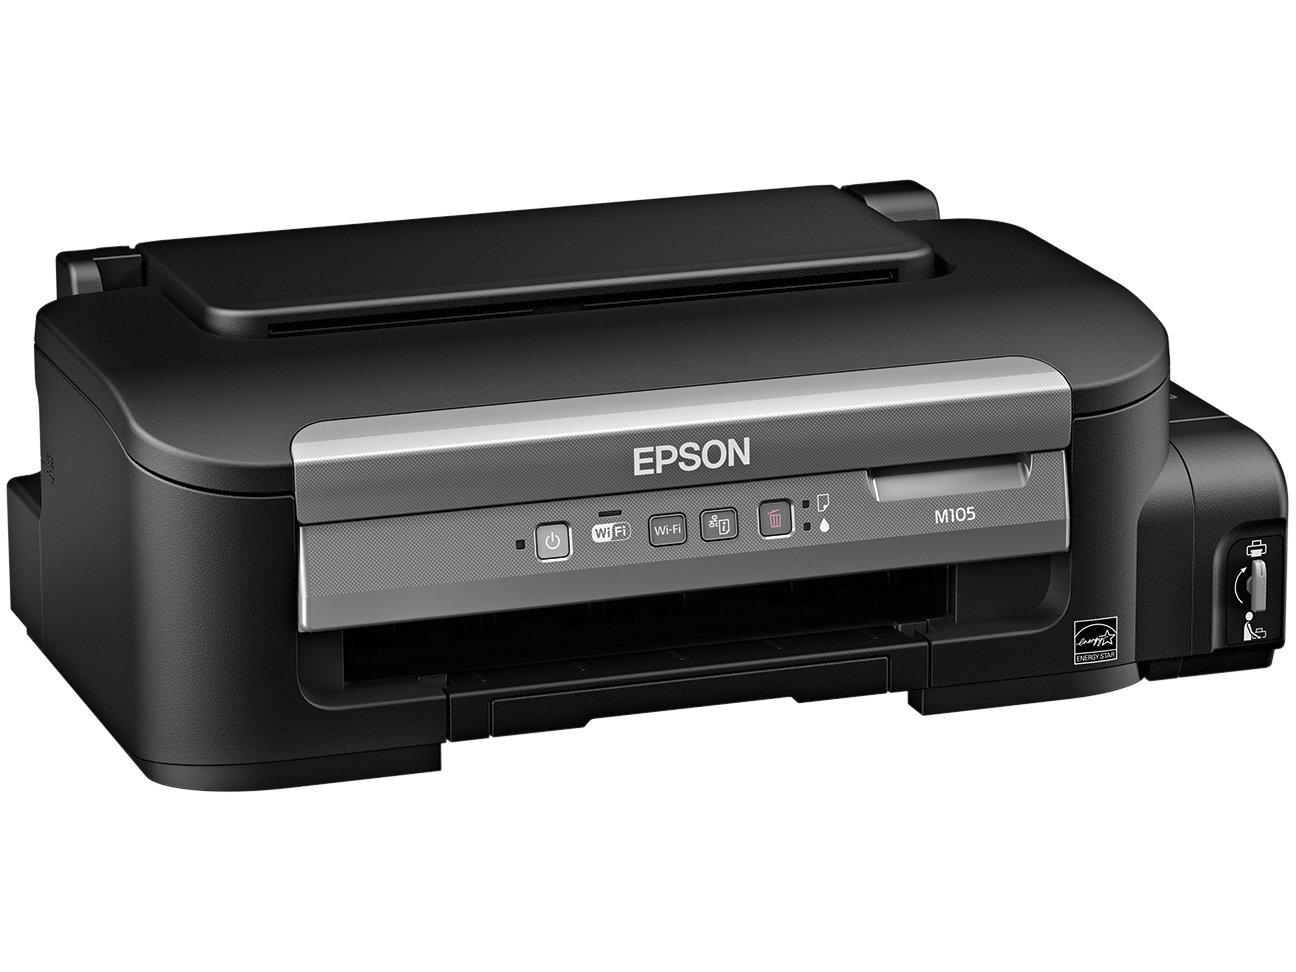 Foto 4 - Impressora Epson Monocromática M105 - Wi-Fi